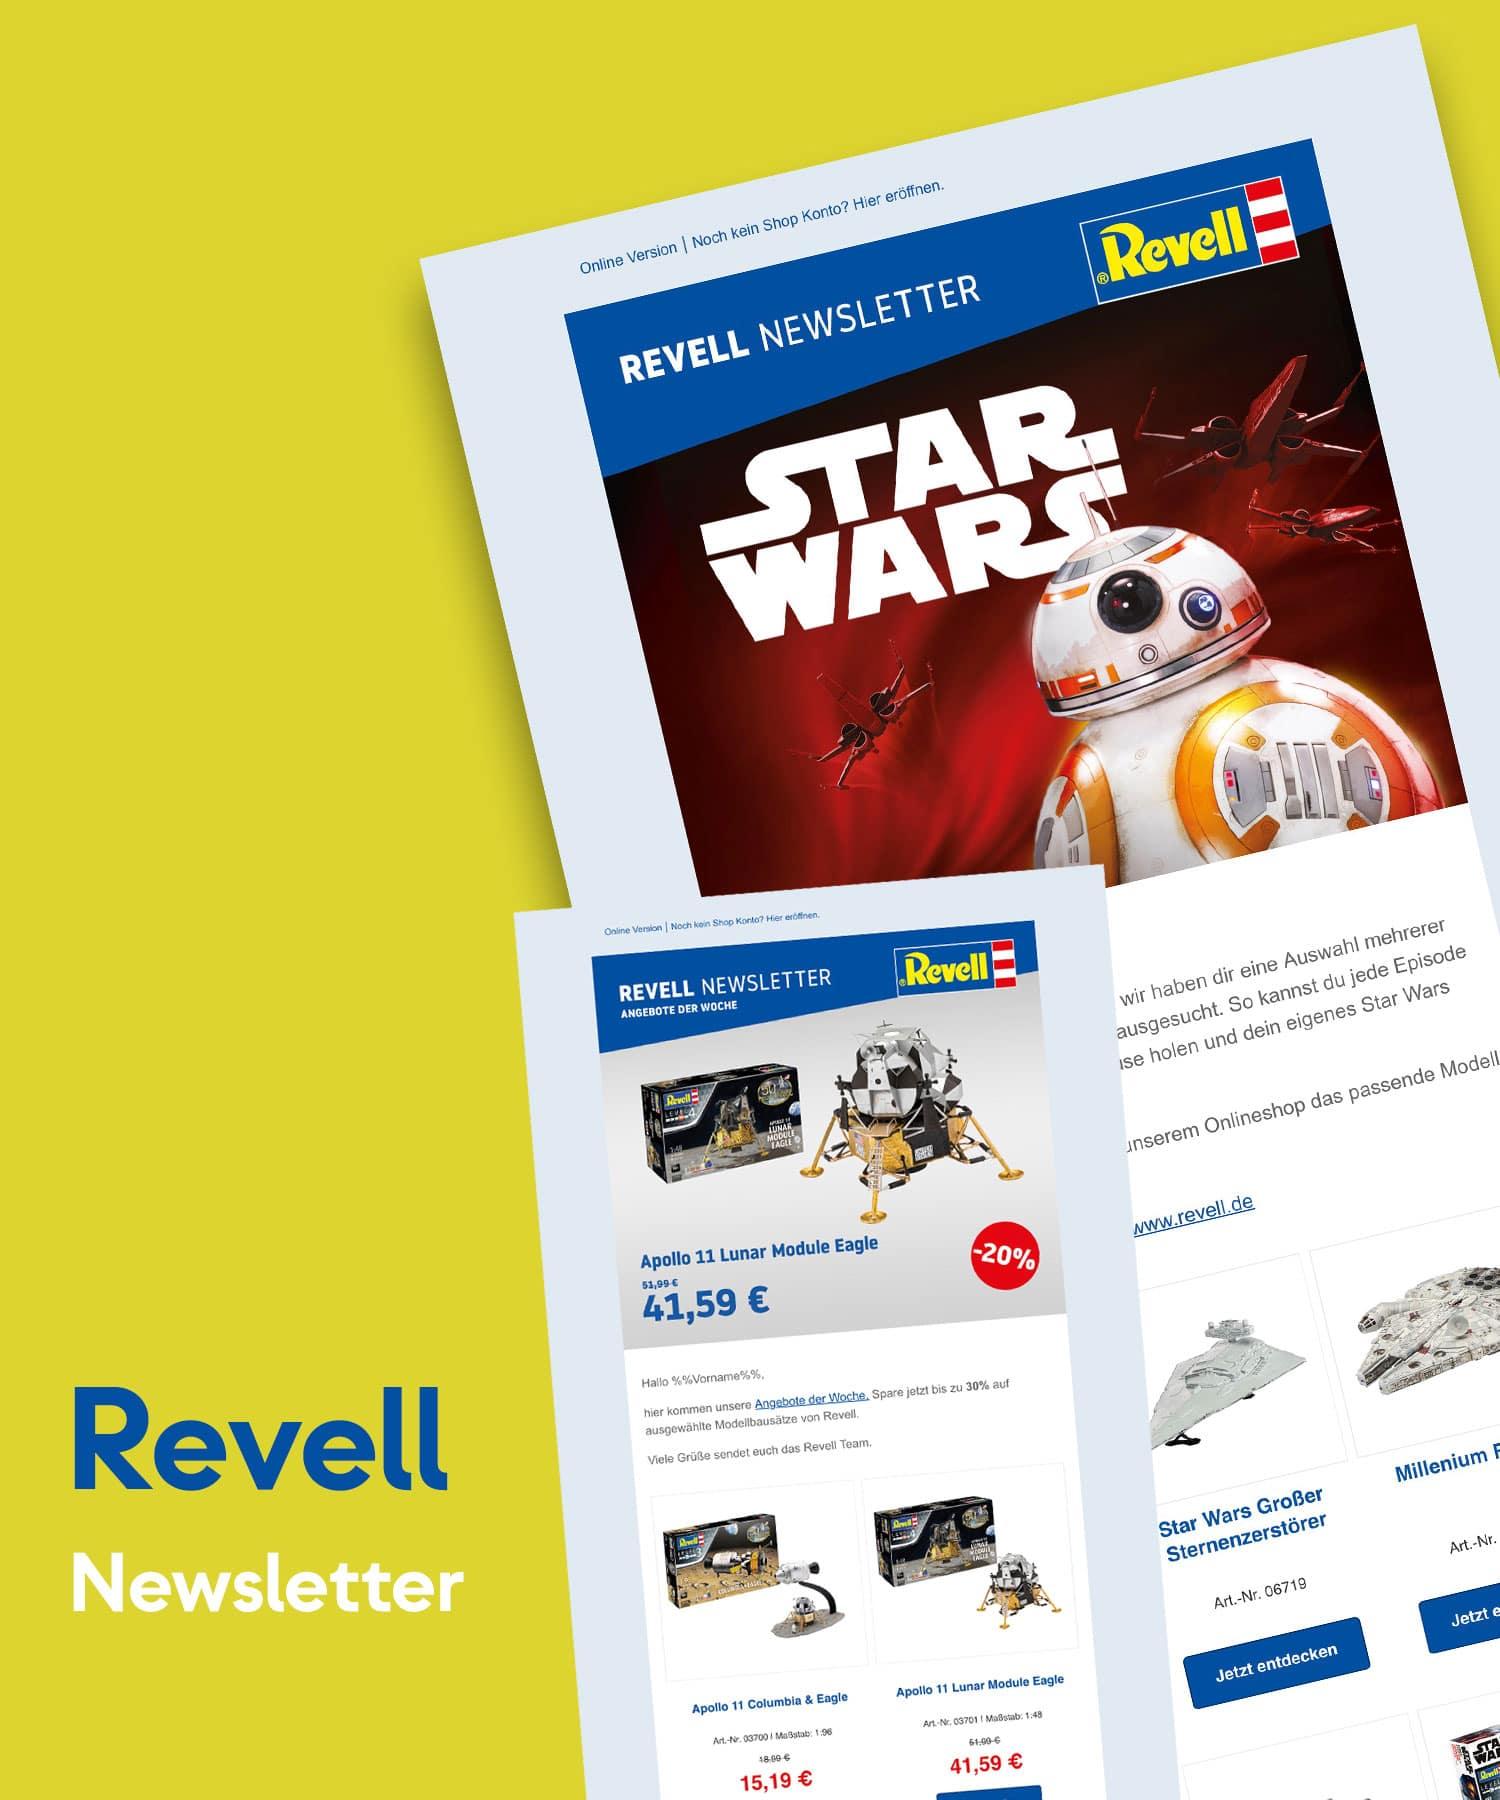 Revell GmbH